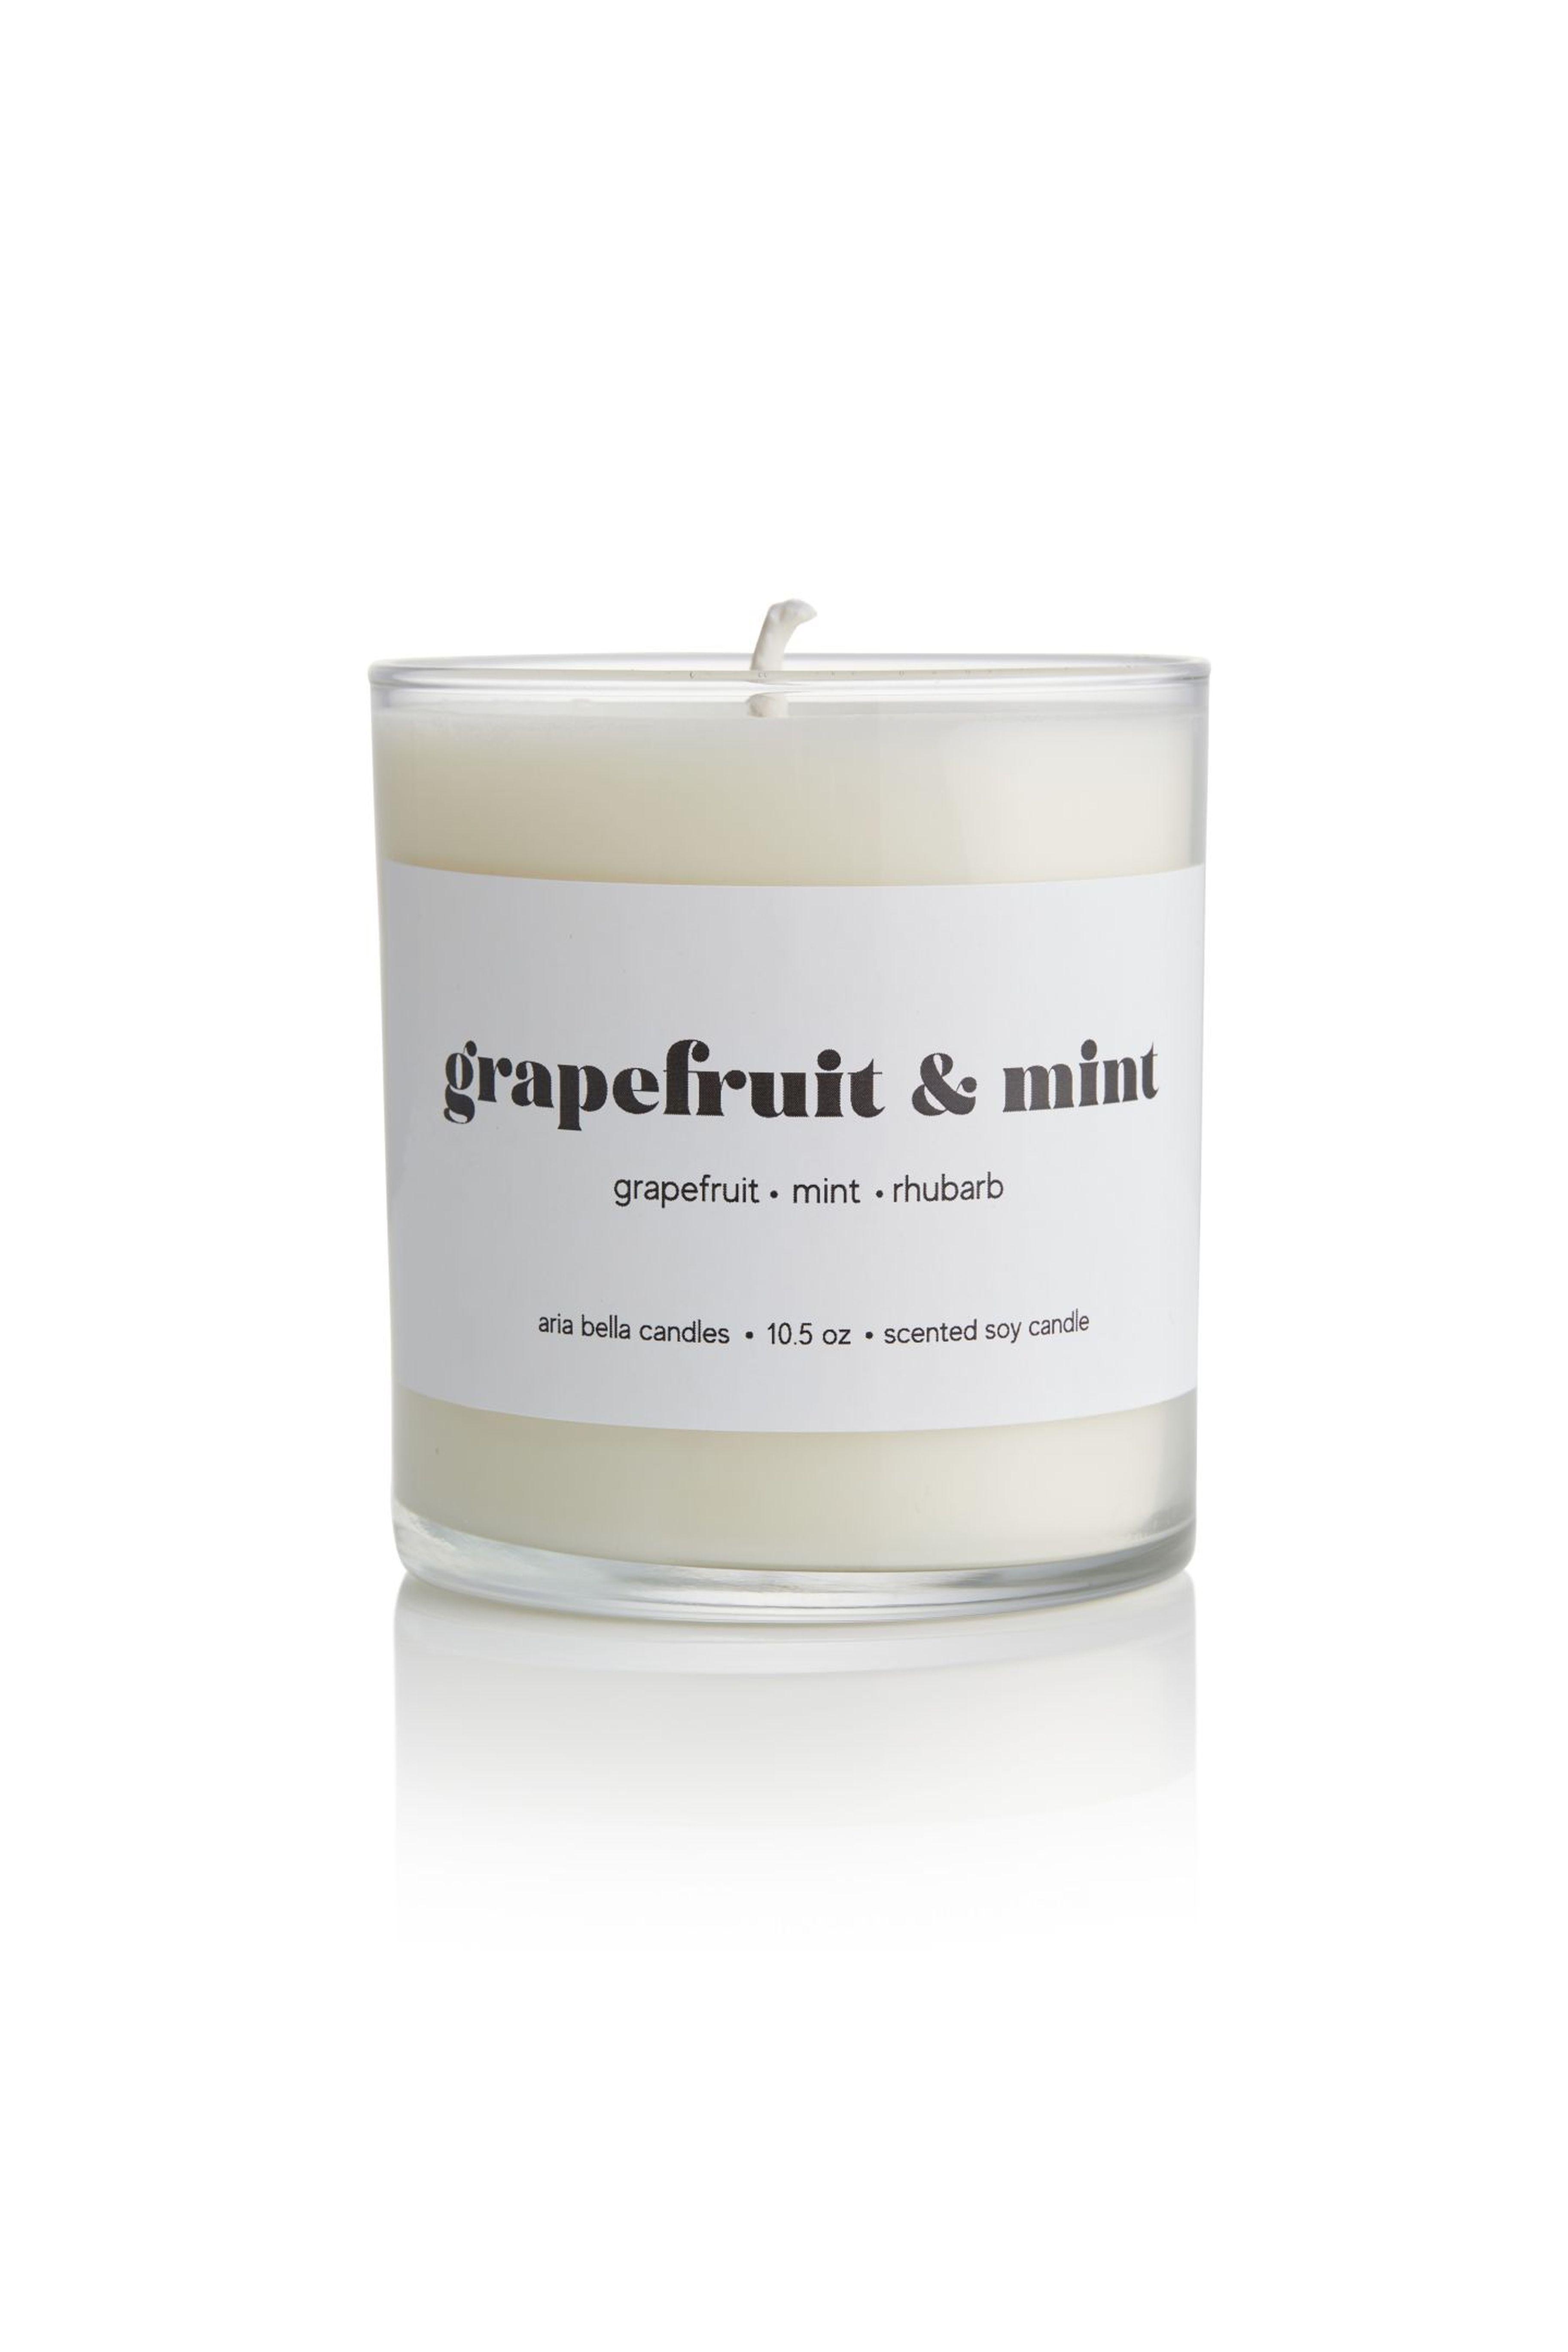 Grapefruit & Mint Candle - Aria Bella